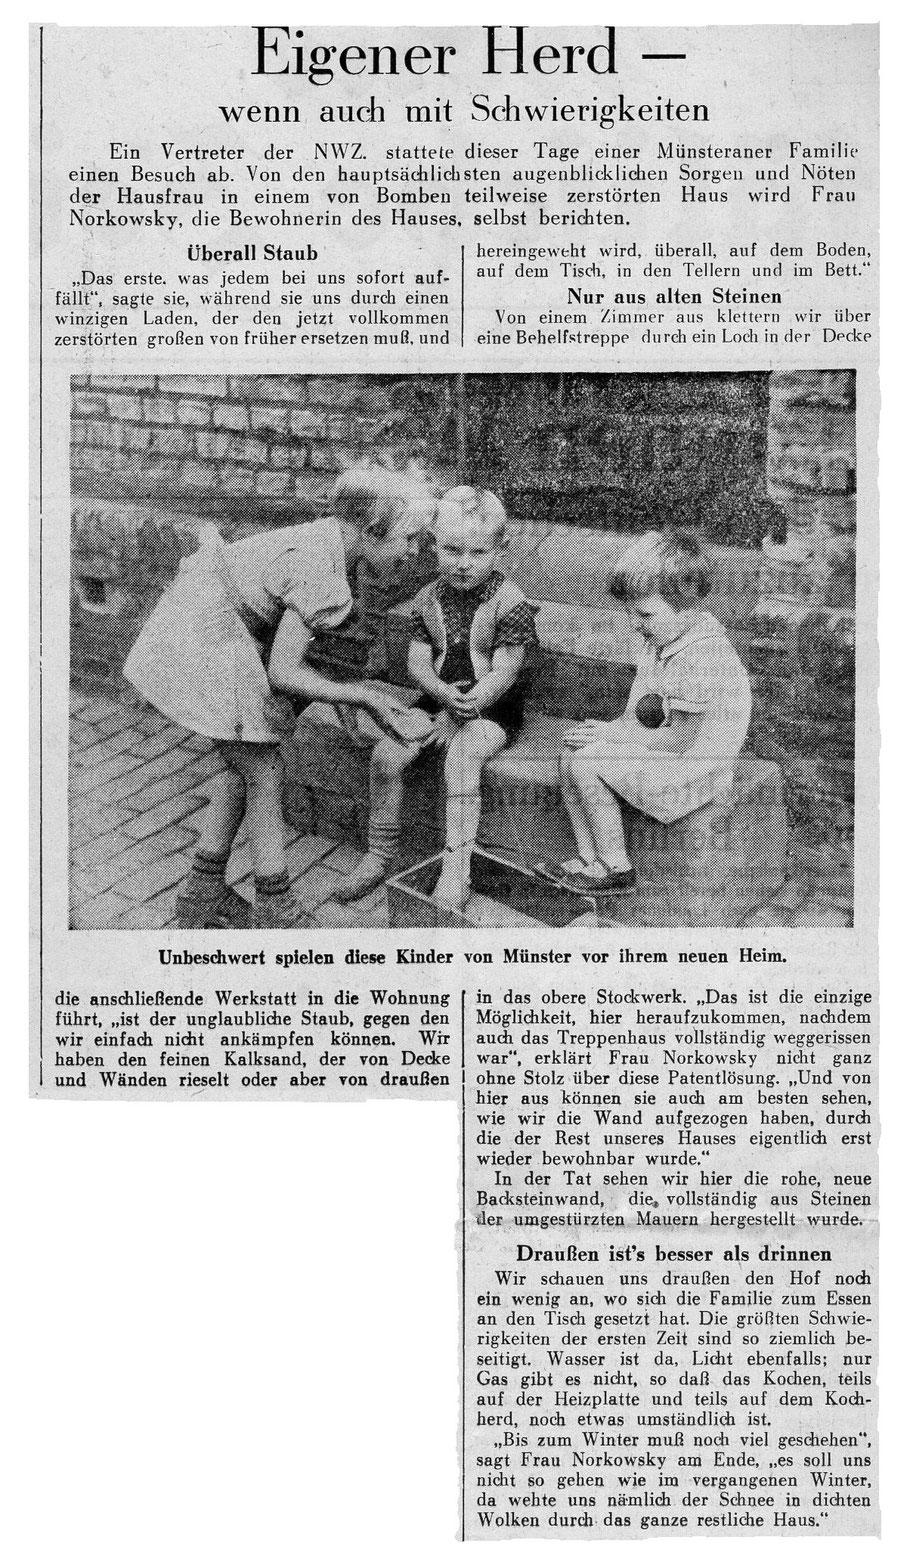 29.6.1945